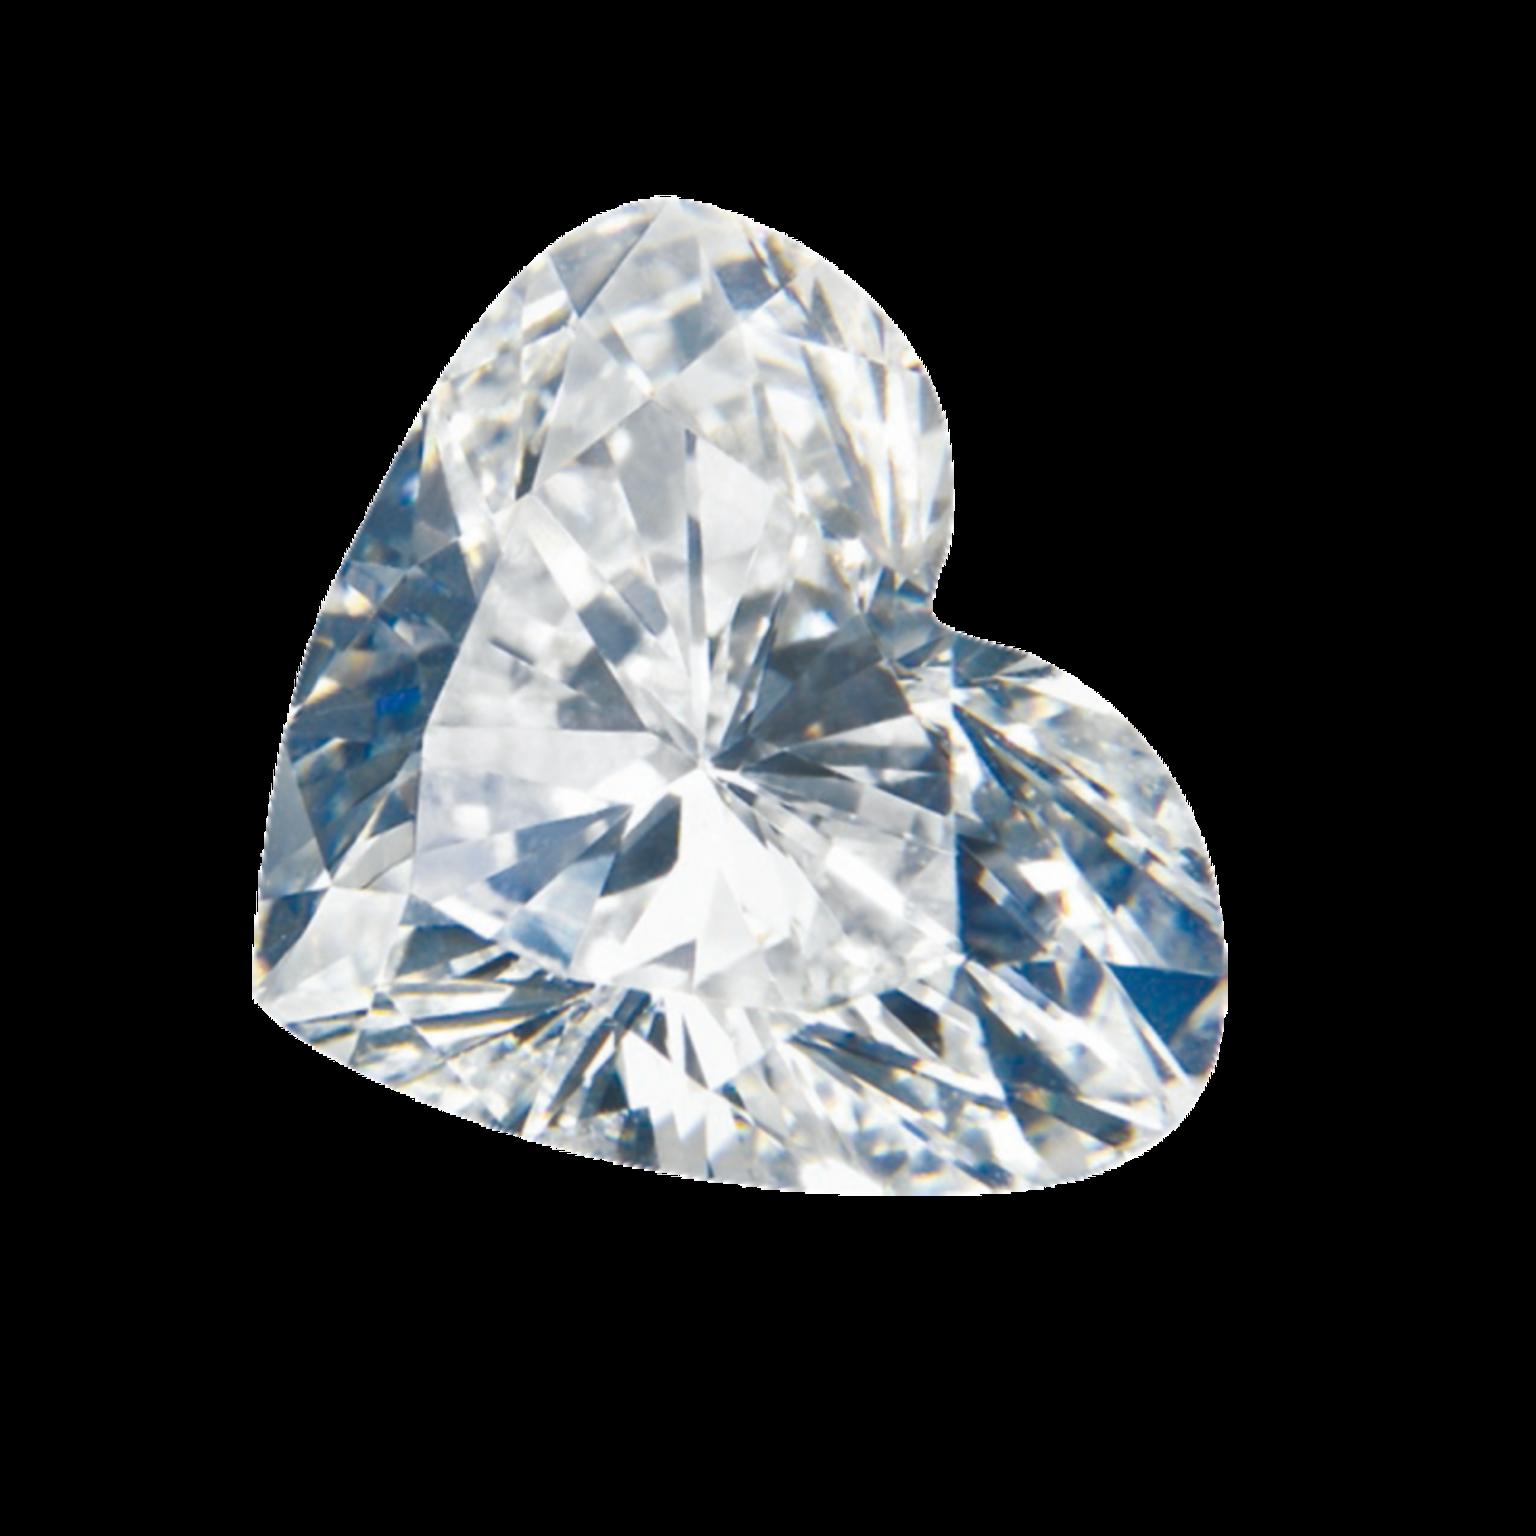 GASSAN Diamonds Heart Shape cut diamond